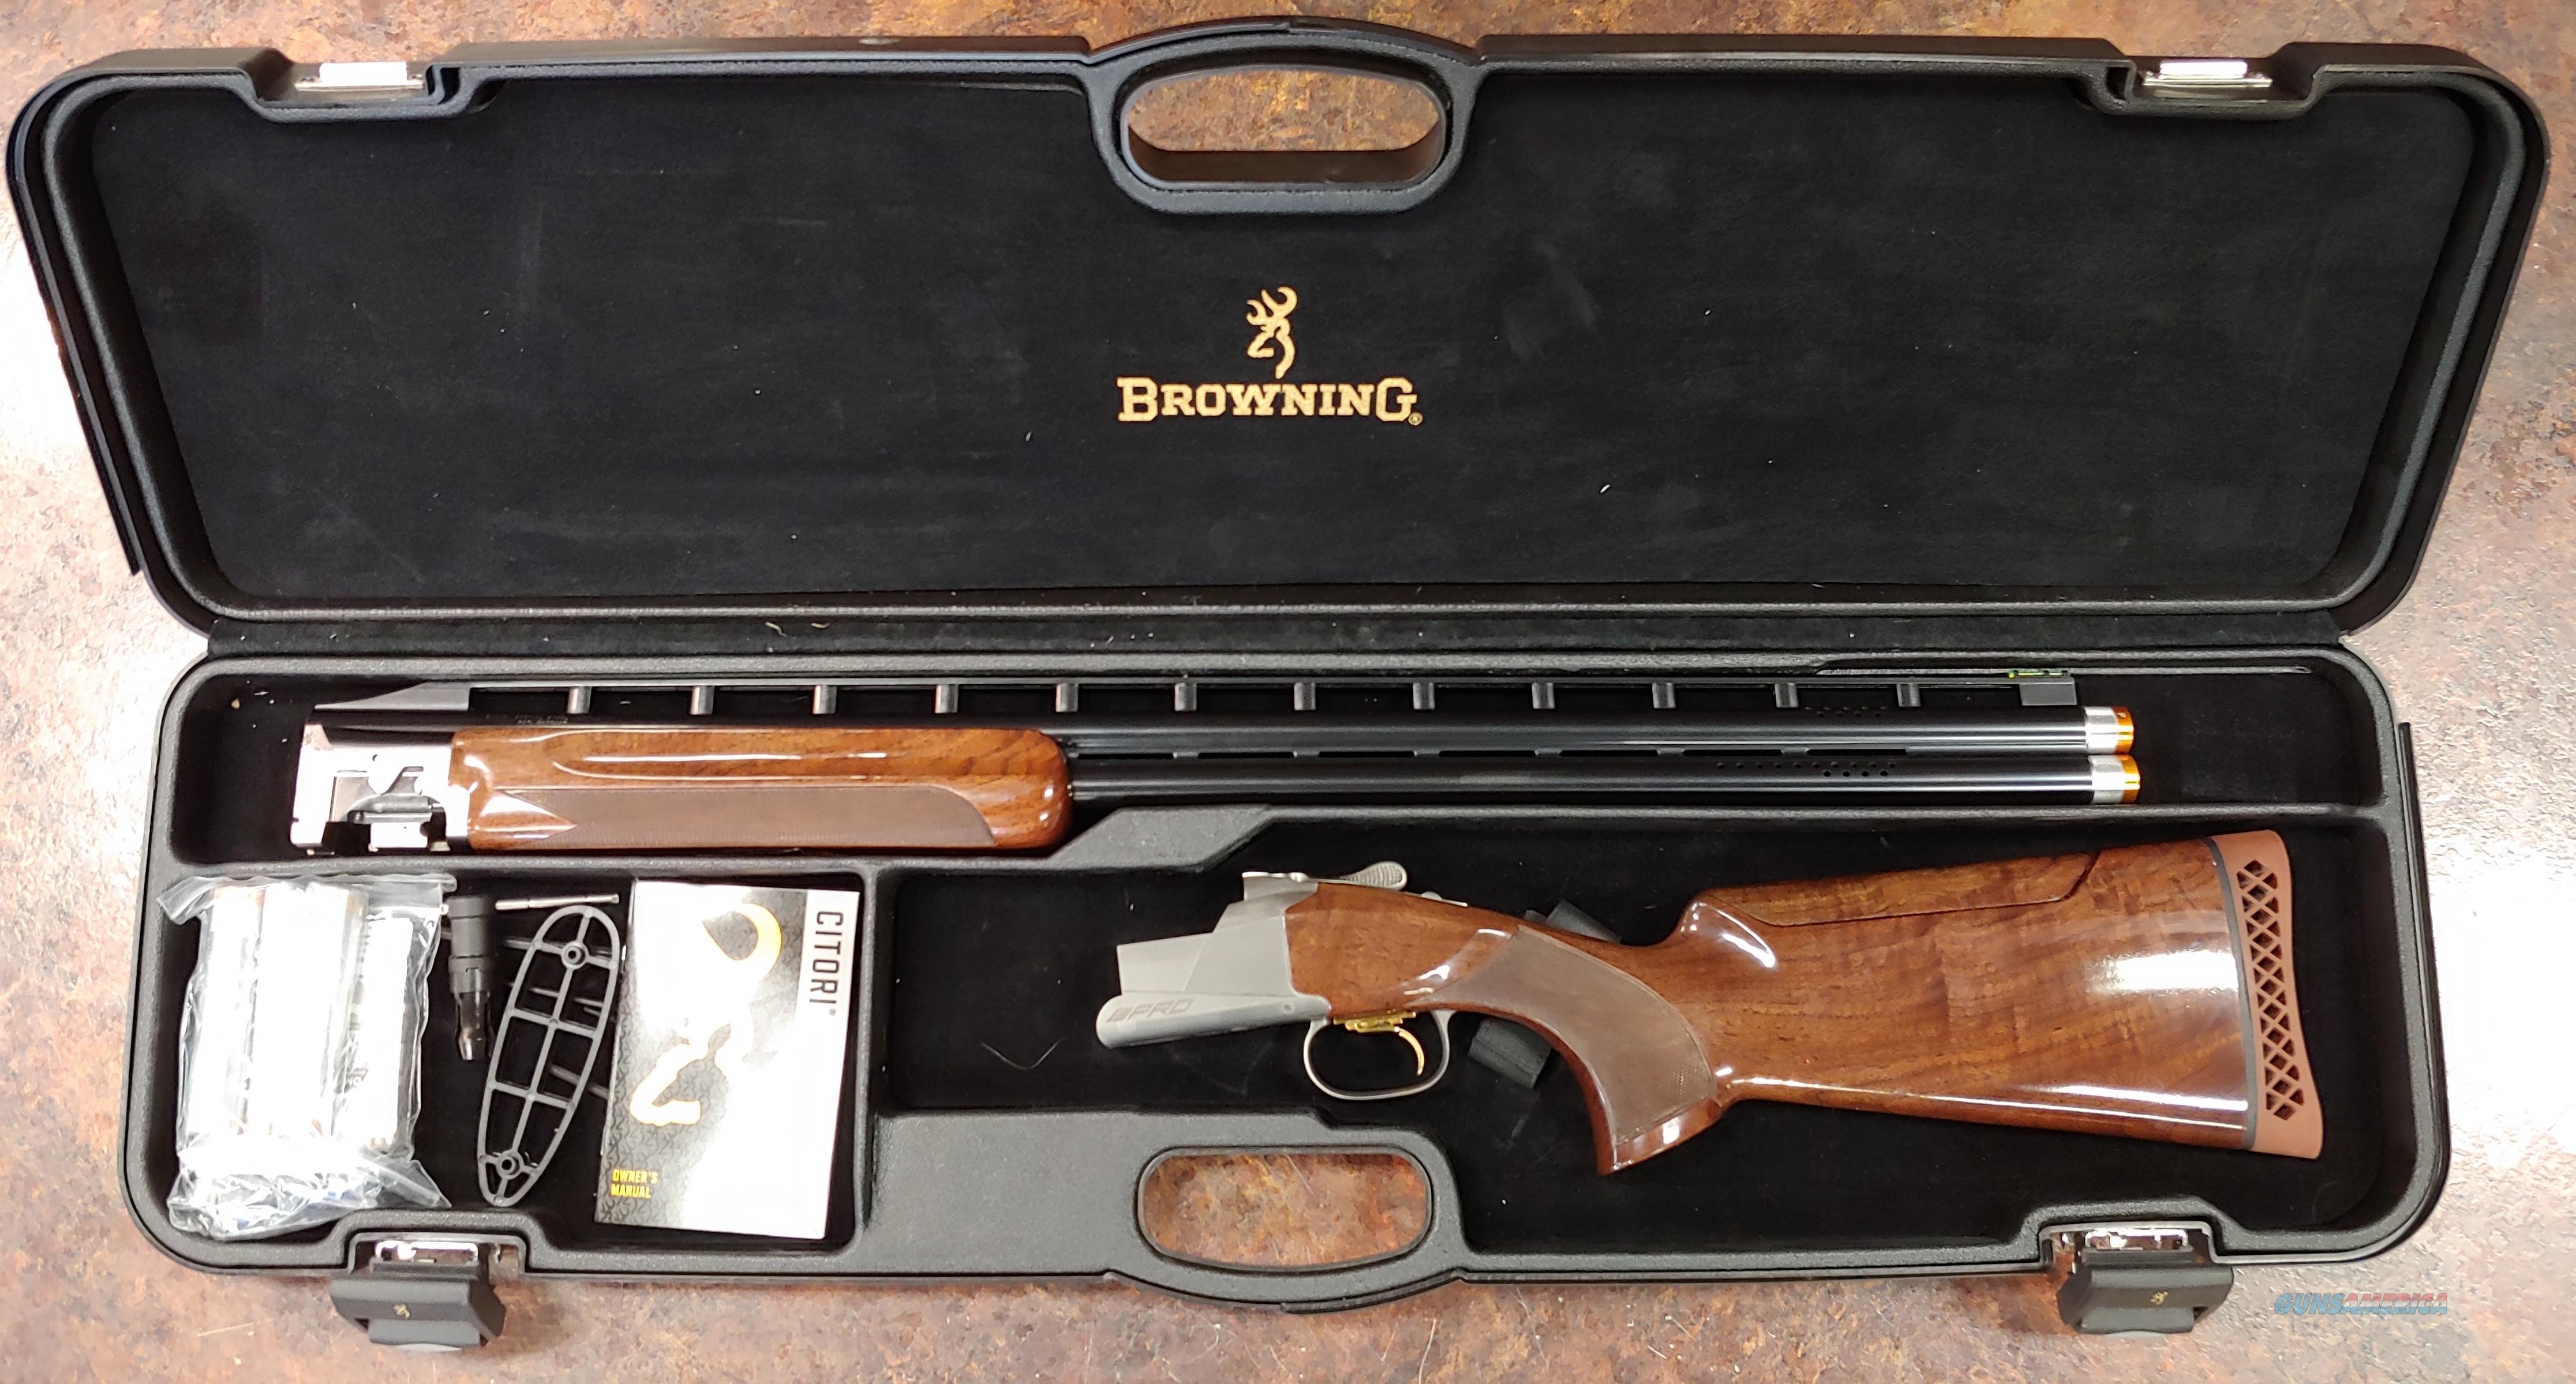 "BROWNING CITORI 725 TRAP ADJUSTABLE COMB 12GA 30"" 2.75""   Guns > Shotguns > Browning Shotguns > Over Unders > Citori > Trap/Skeet"